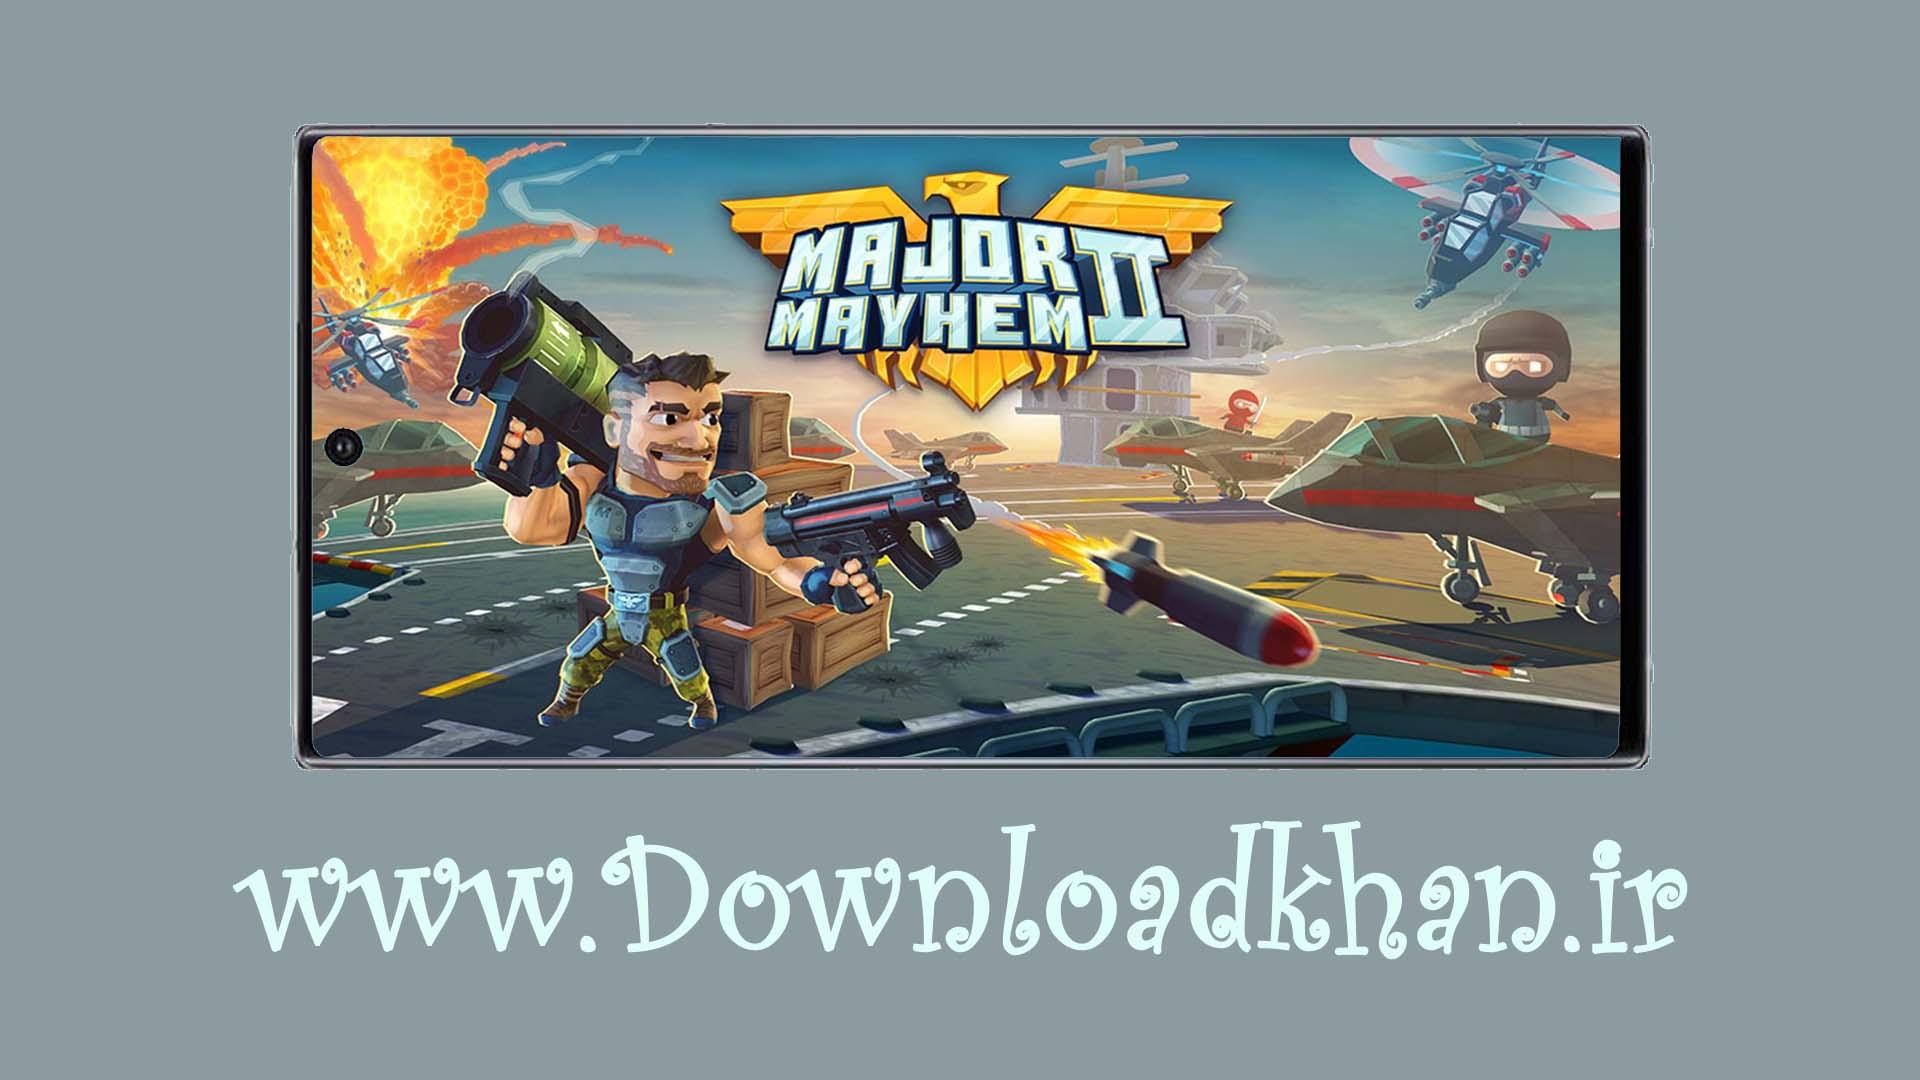 بازی Major-2-mayhem